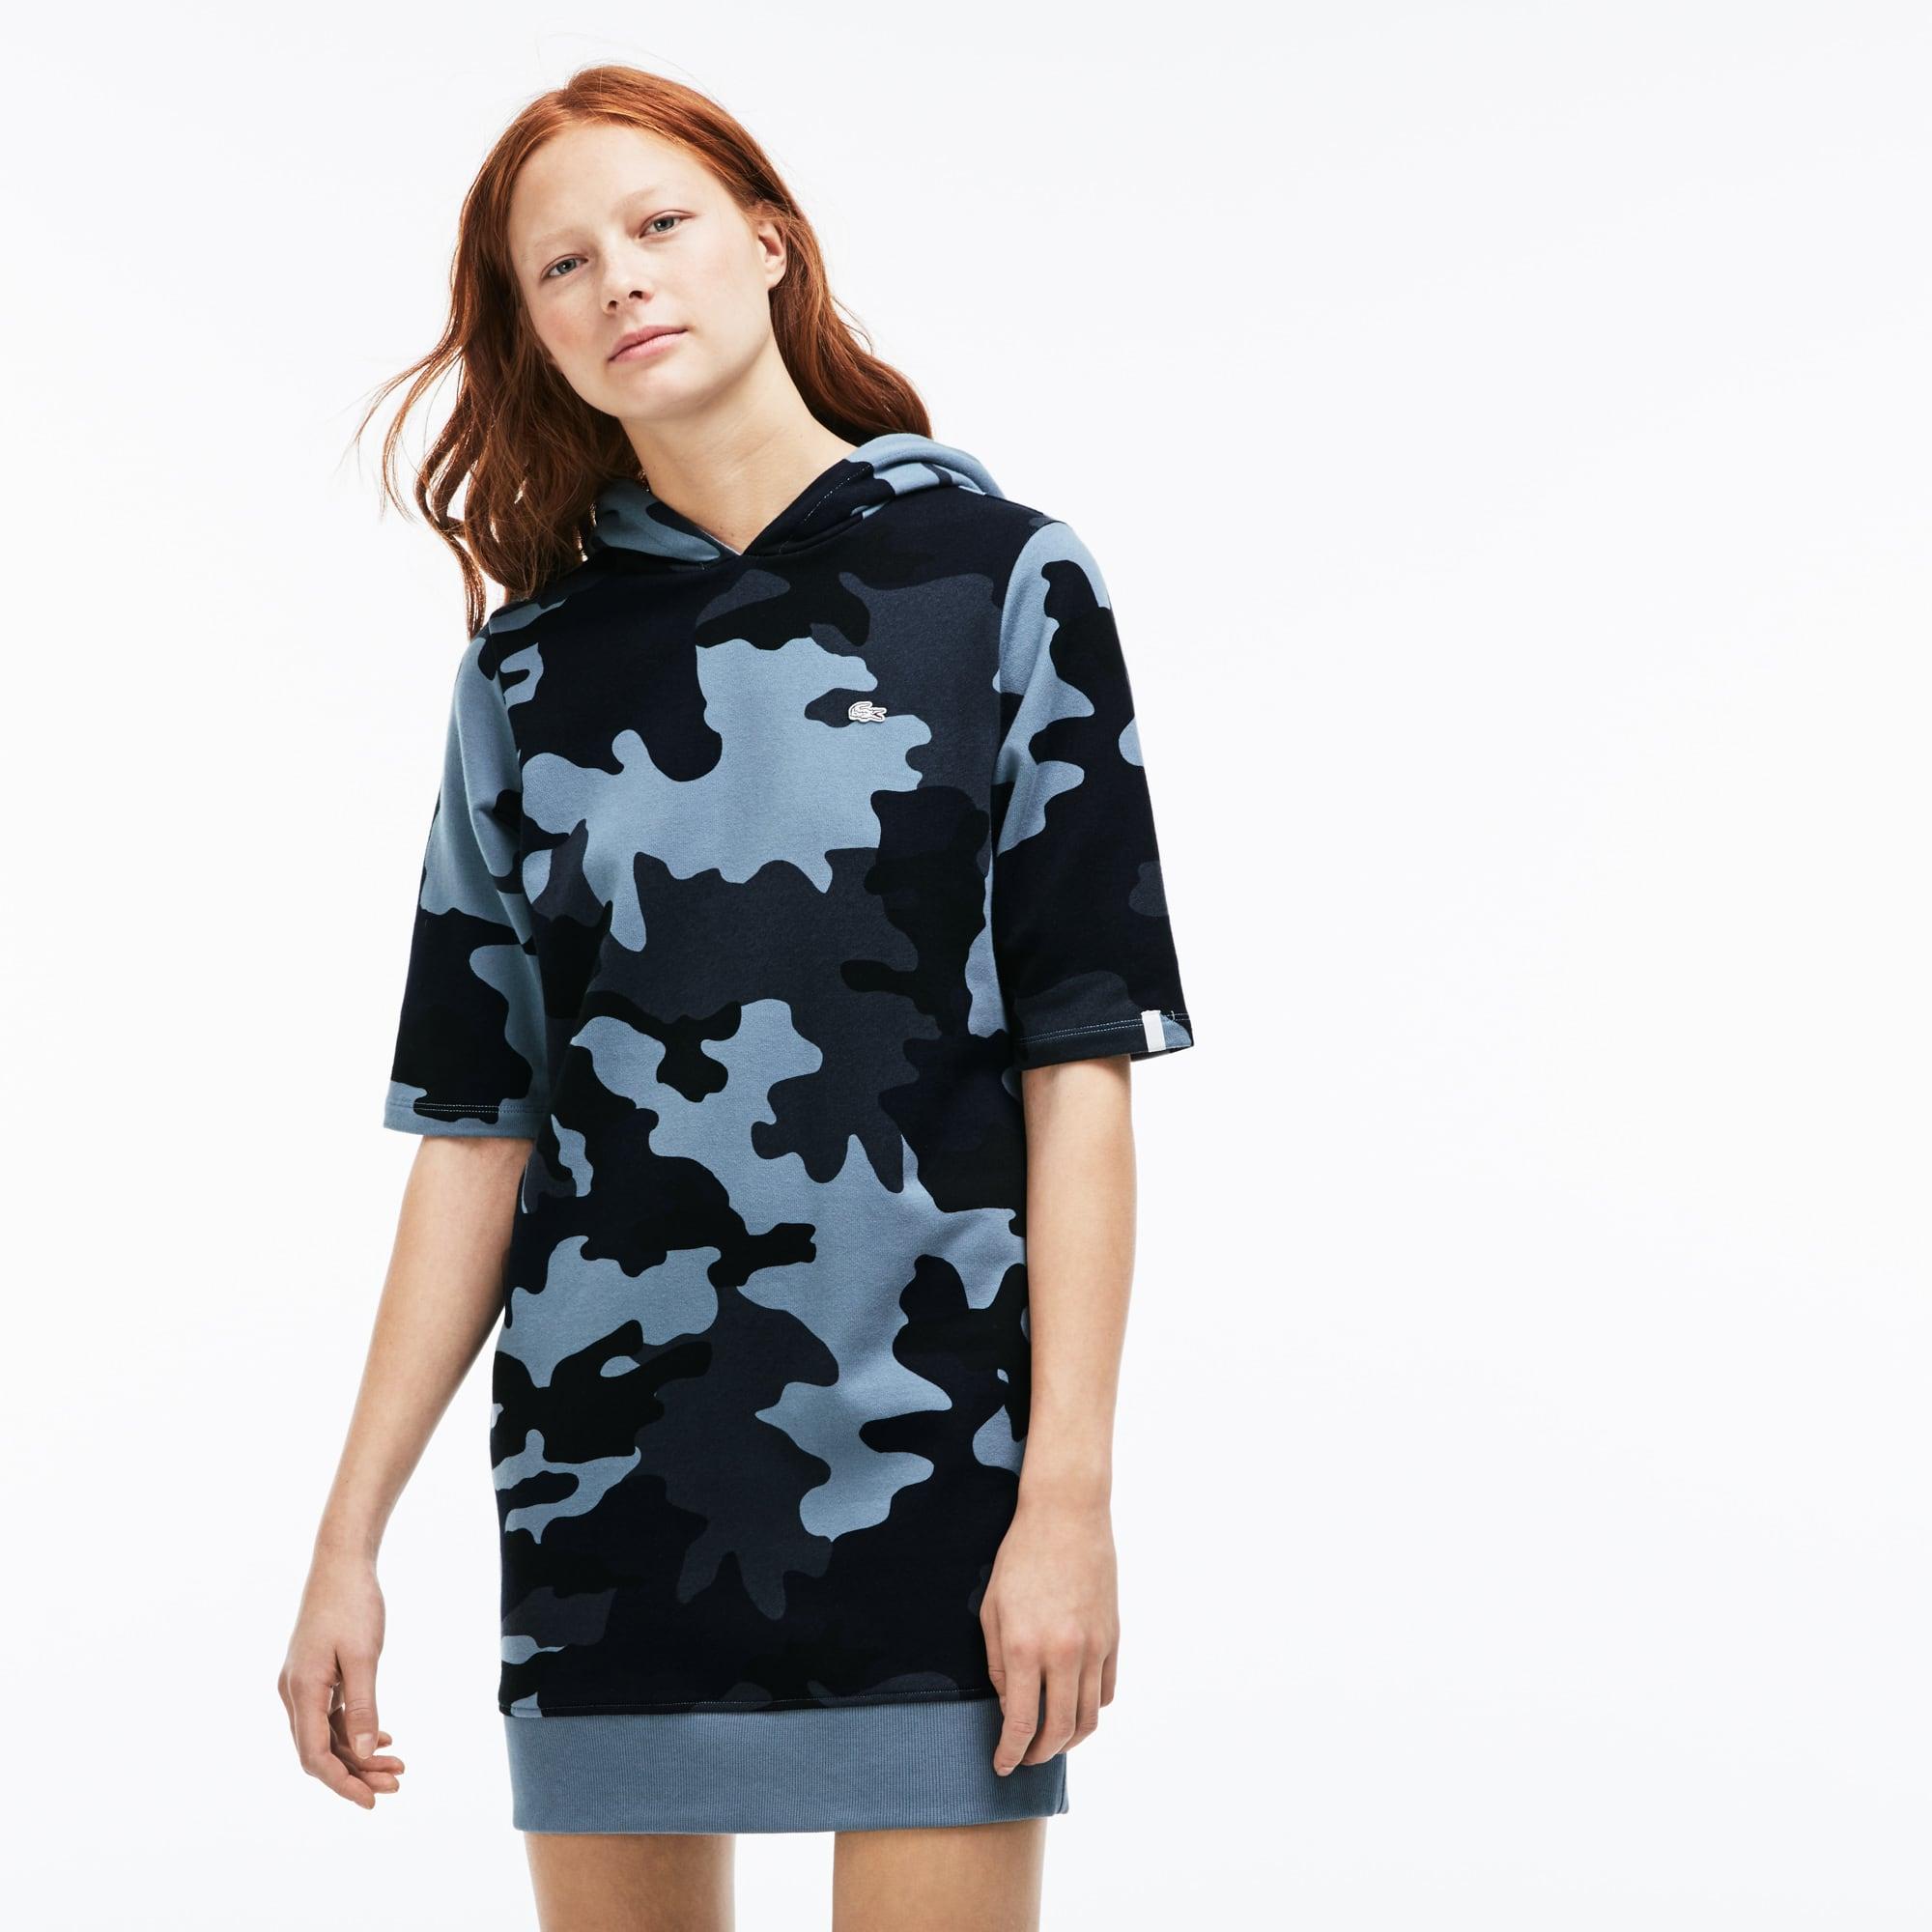 Damen-Sweatshirtkleid aus Fleece mit Kapuze LACOSTE L!VE